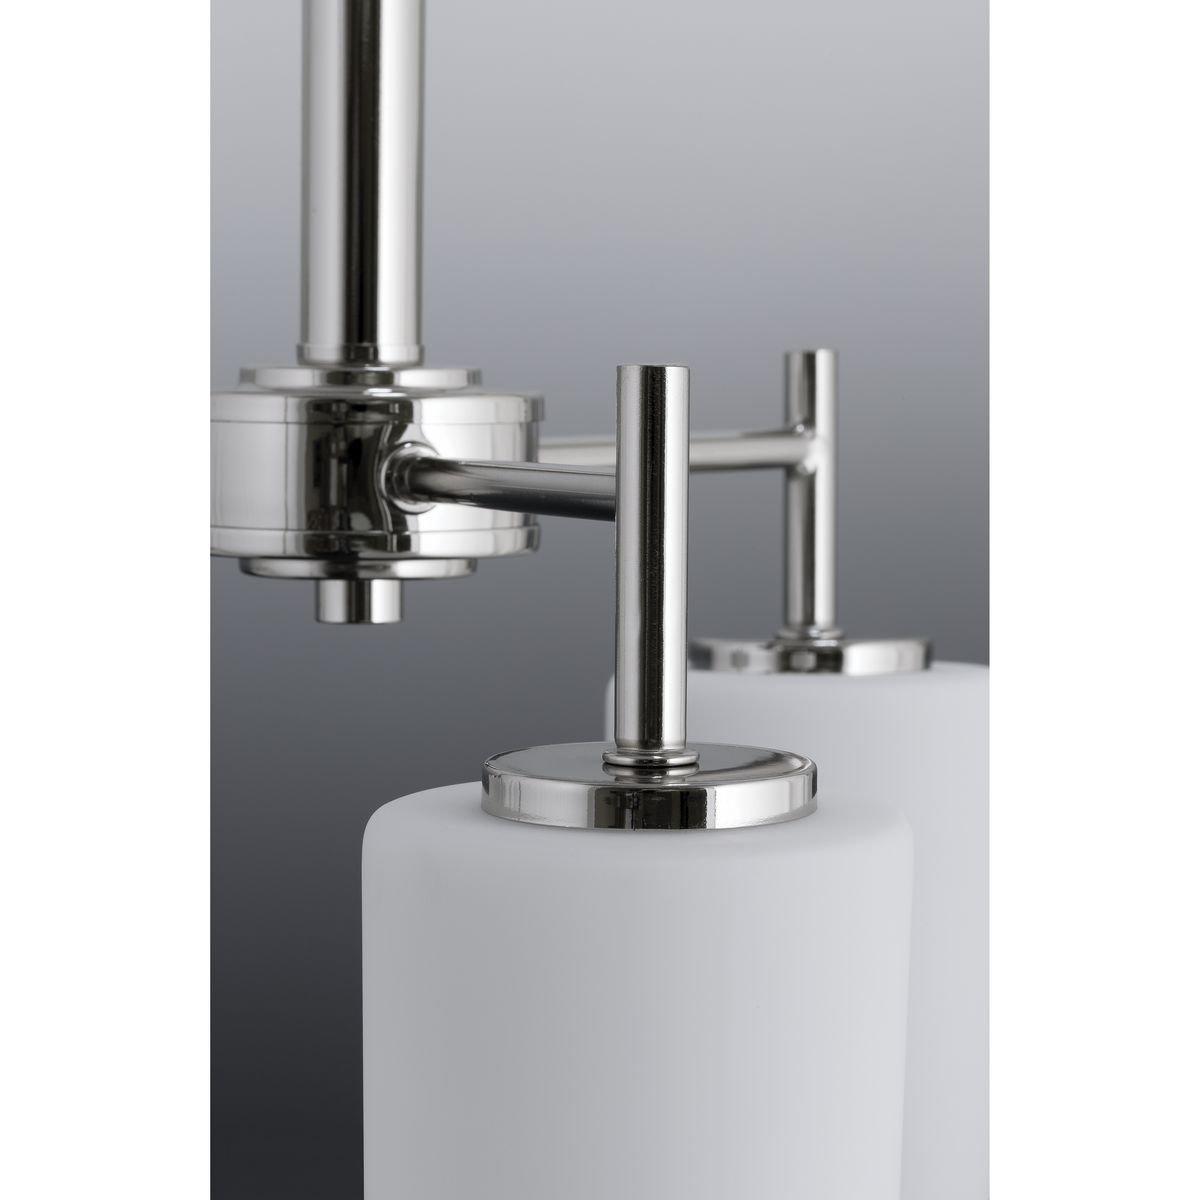 Progress Lighting P2159-09 Contemporary/Soft 3-100W Med Bath Bracket, Brushed Nickel by Progress Lighting (Image #6)